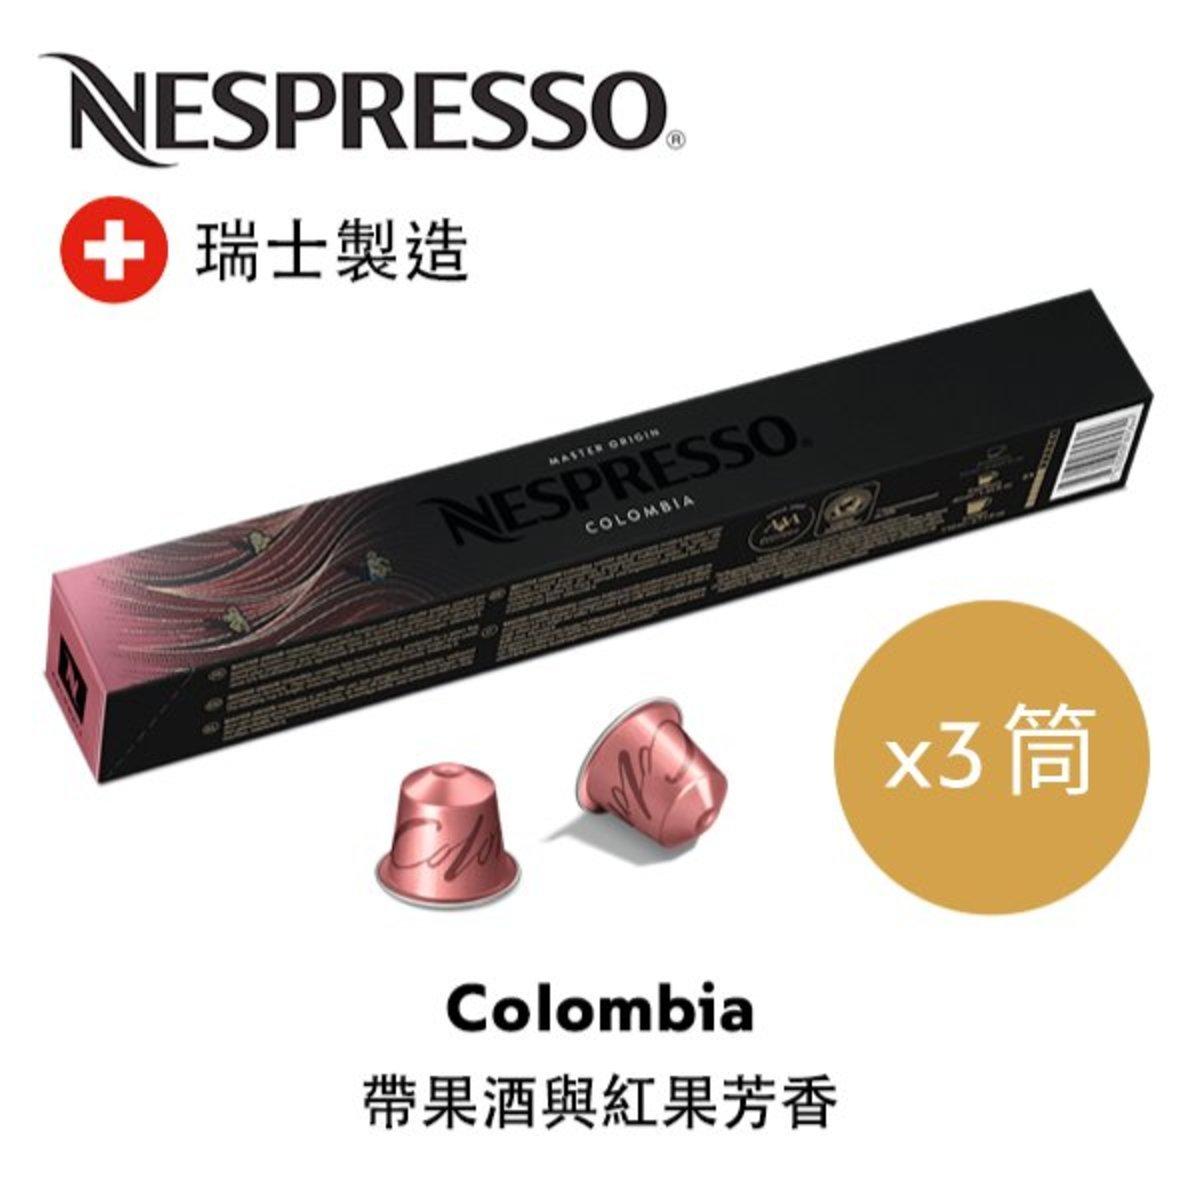 Colombia Coffee Capsules x 3 sleeves- Espresso (10 capsules per sleeve)